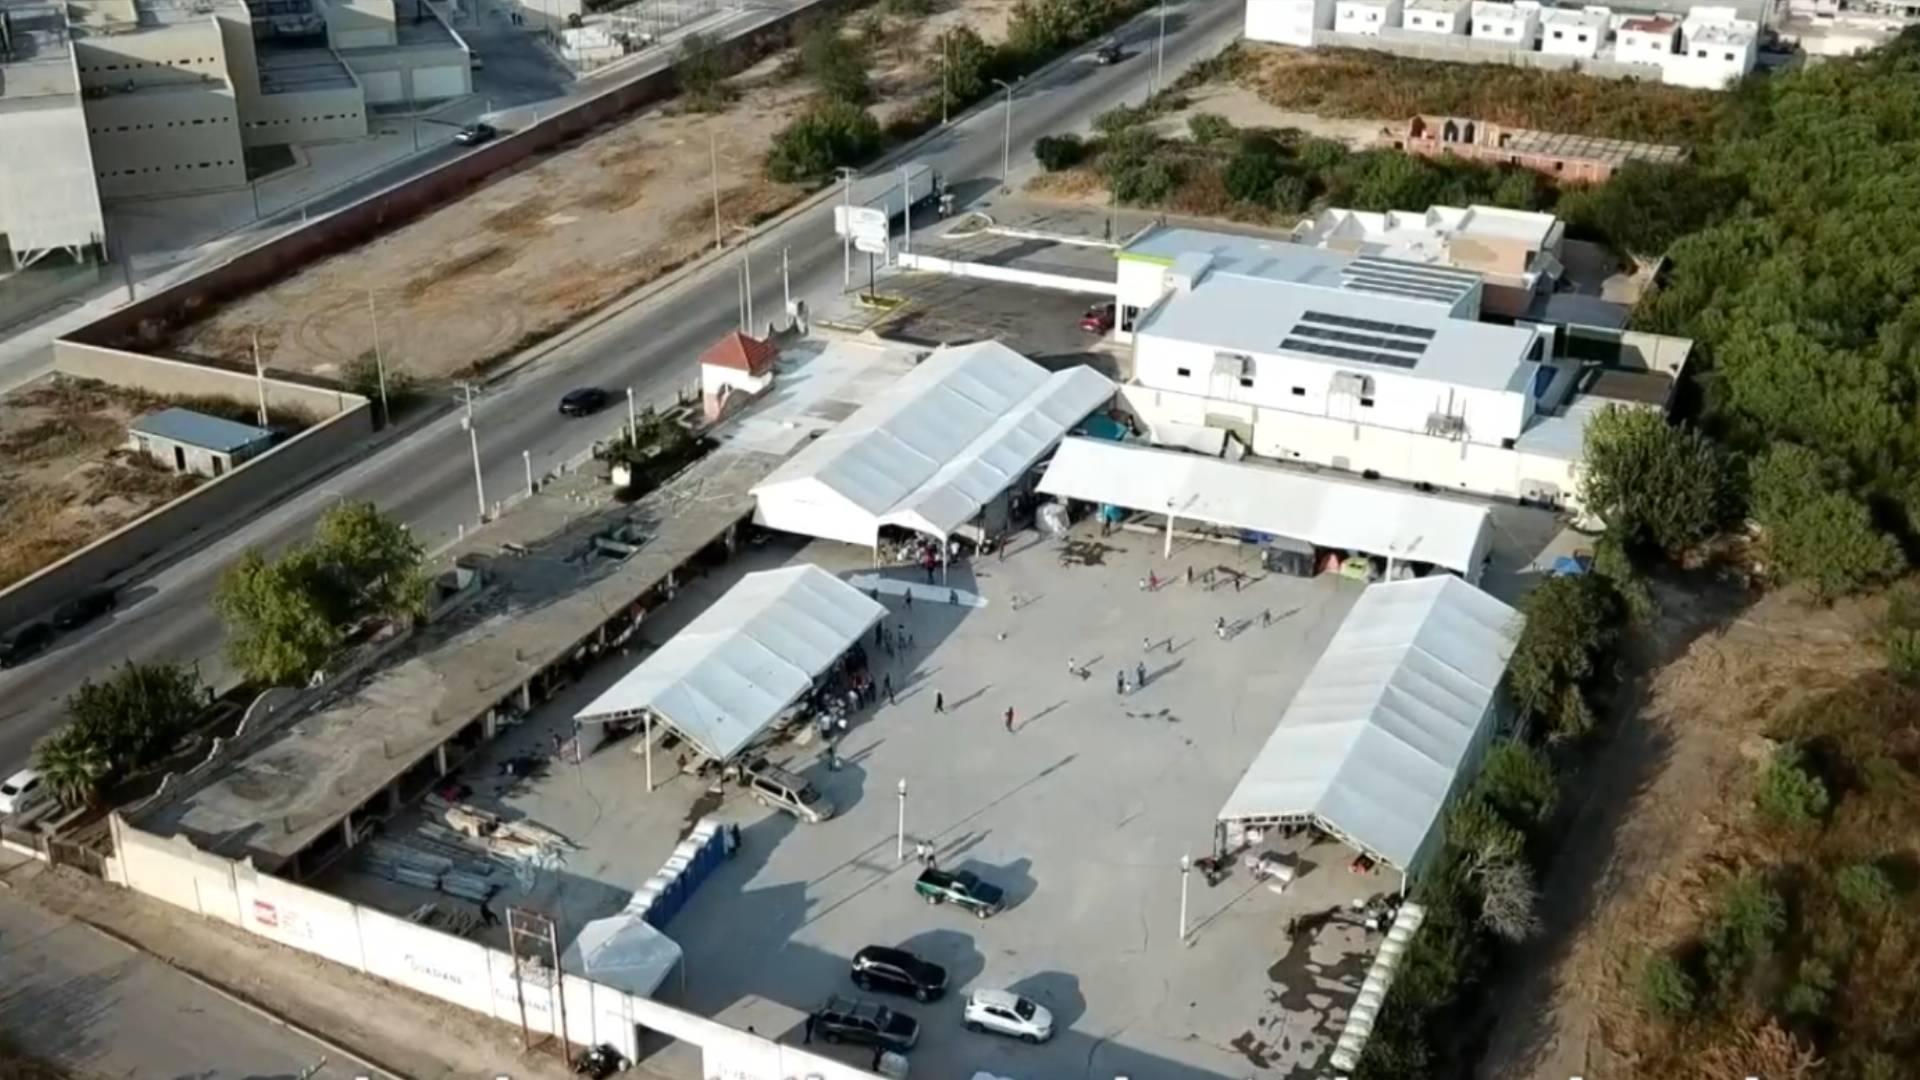 GLOBALink   A visit to migrants' shelter at U.S.-Mexico border